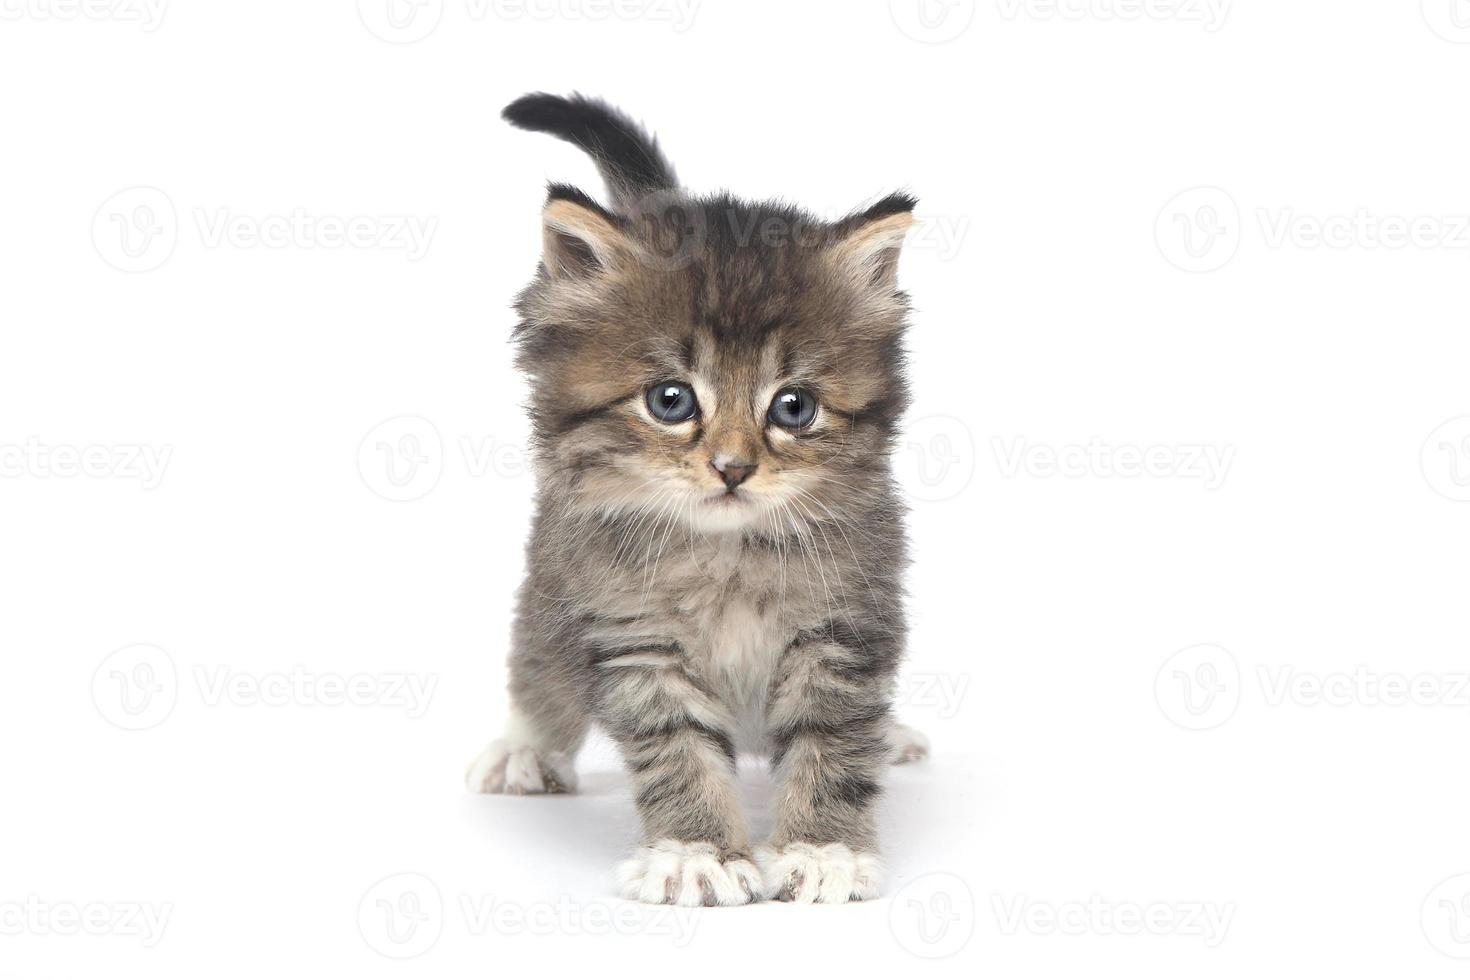 söt liten kattunge på en vit bakgrund foto